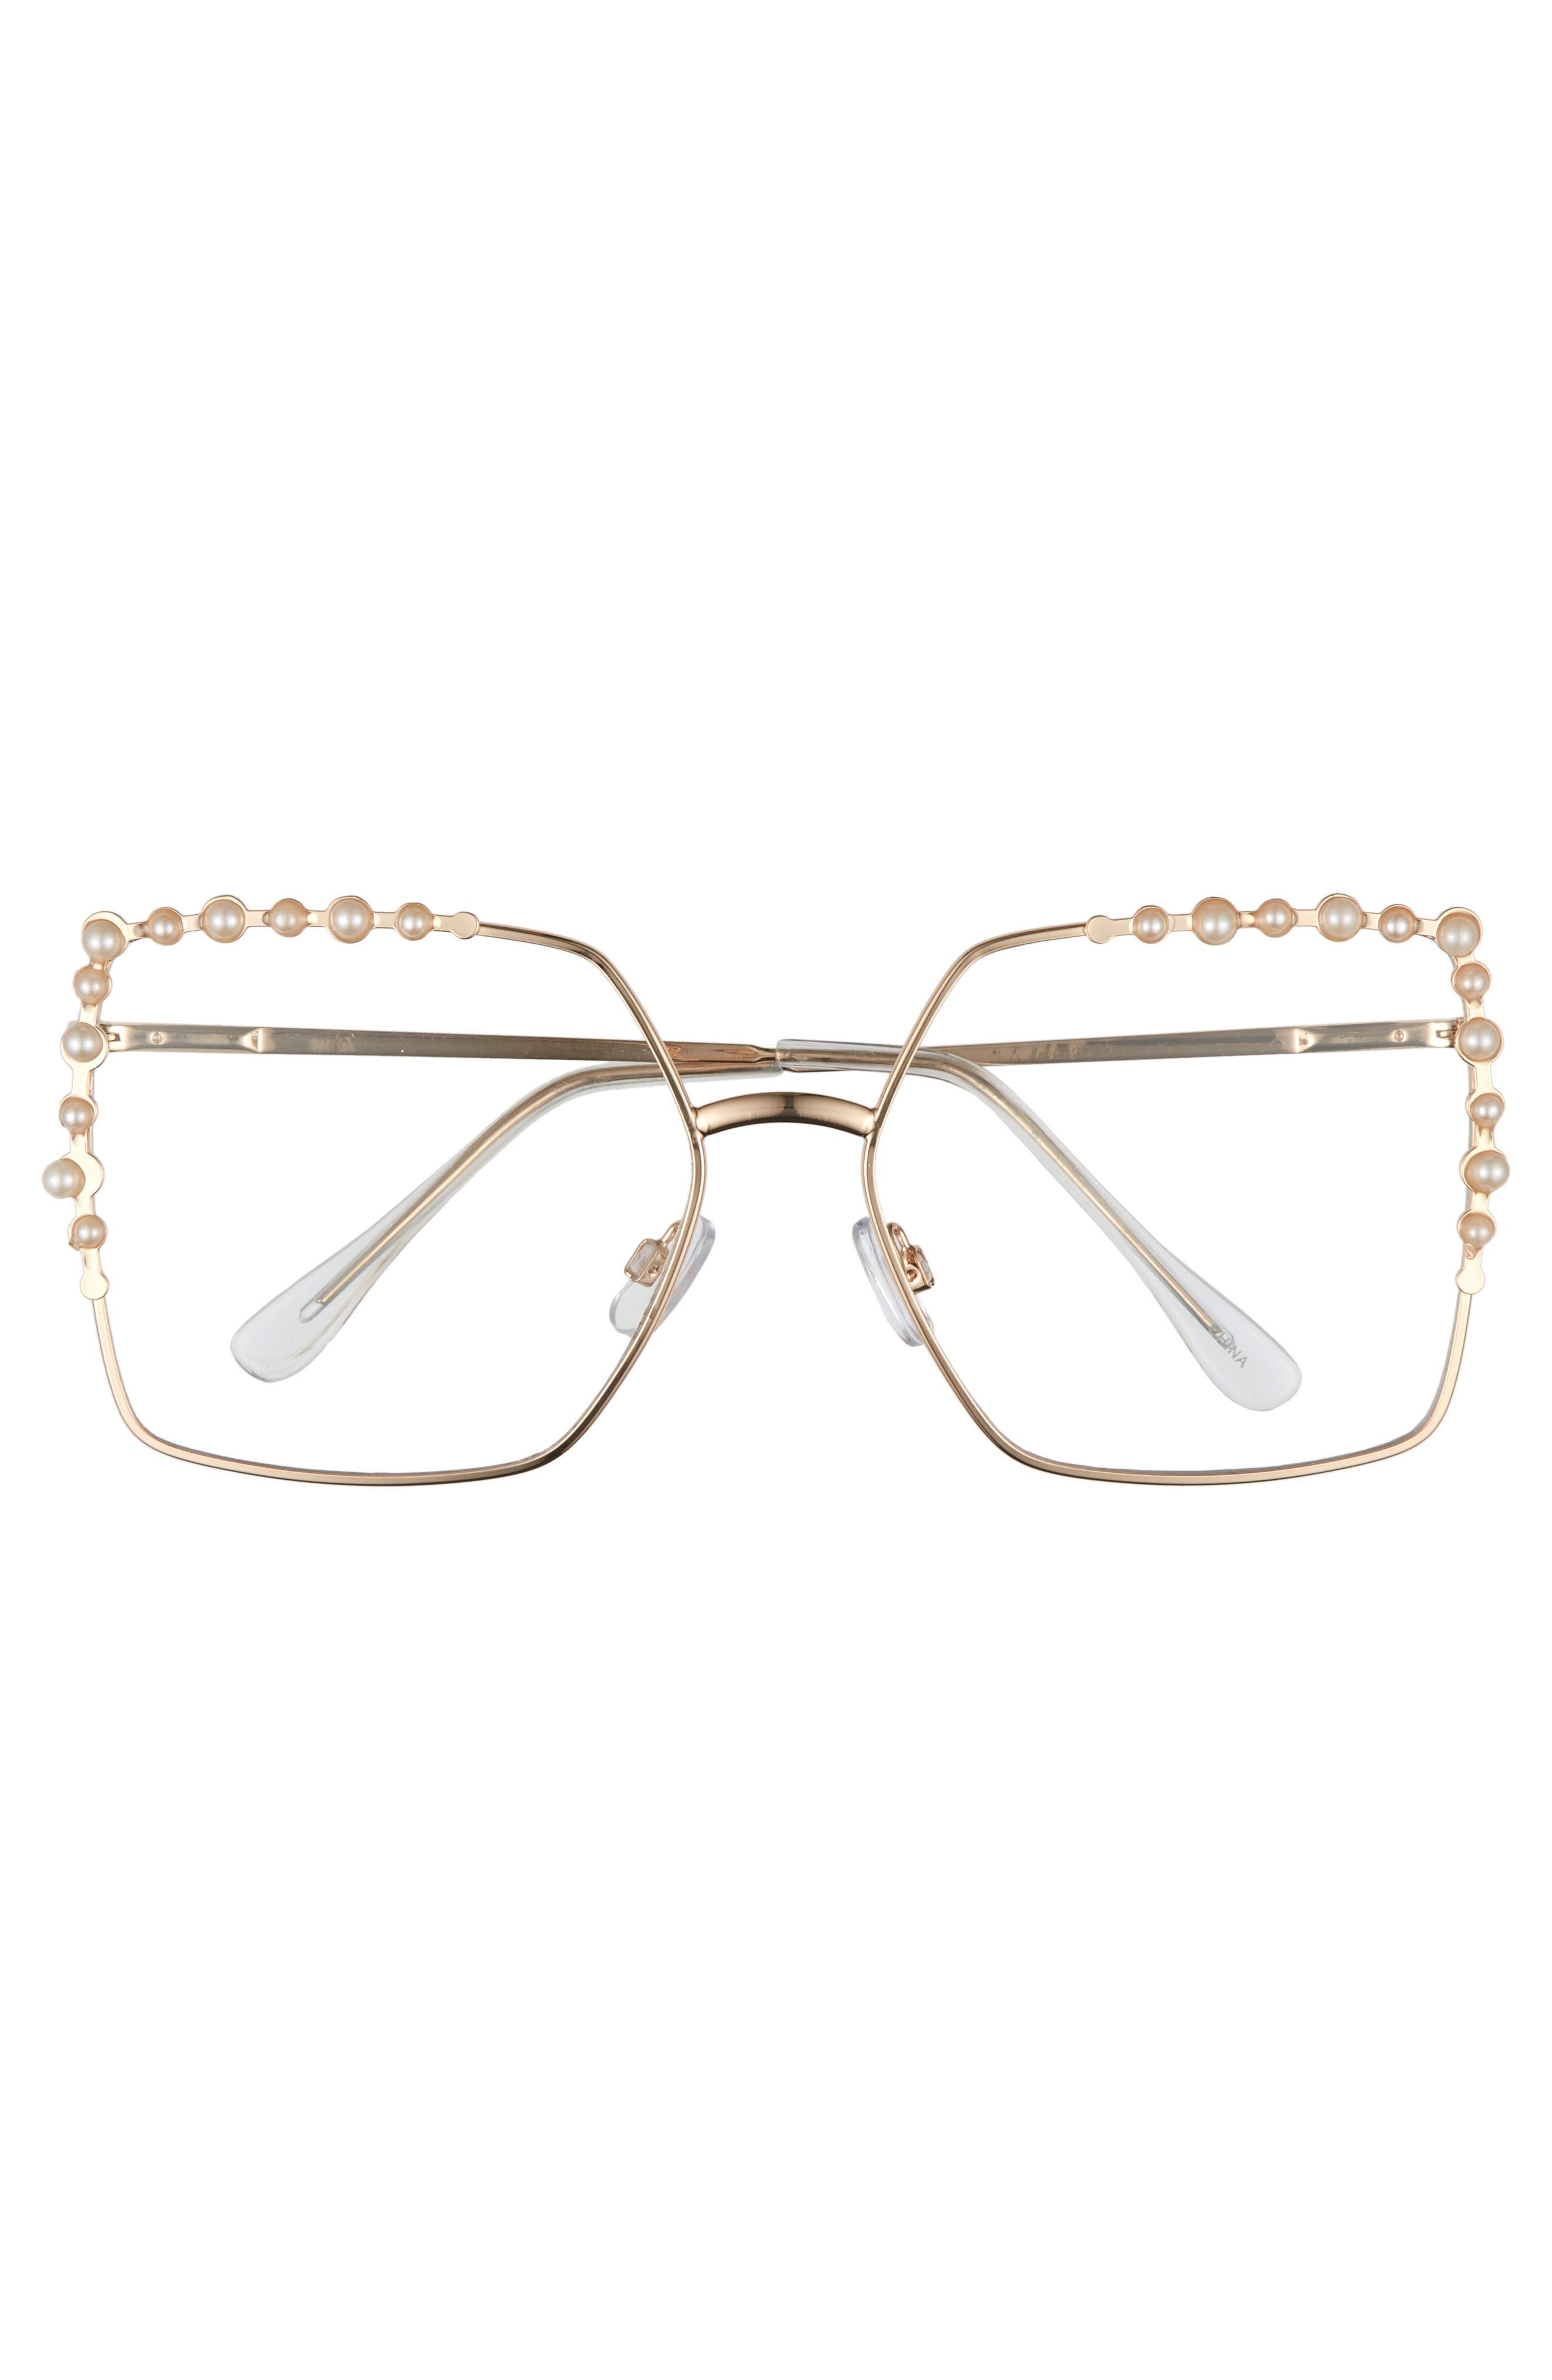 63mm Imitation Pearl Square Fashion Glasses,                             Alternate thumbnail 3, color,                             Gold/ Pearl